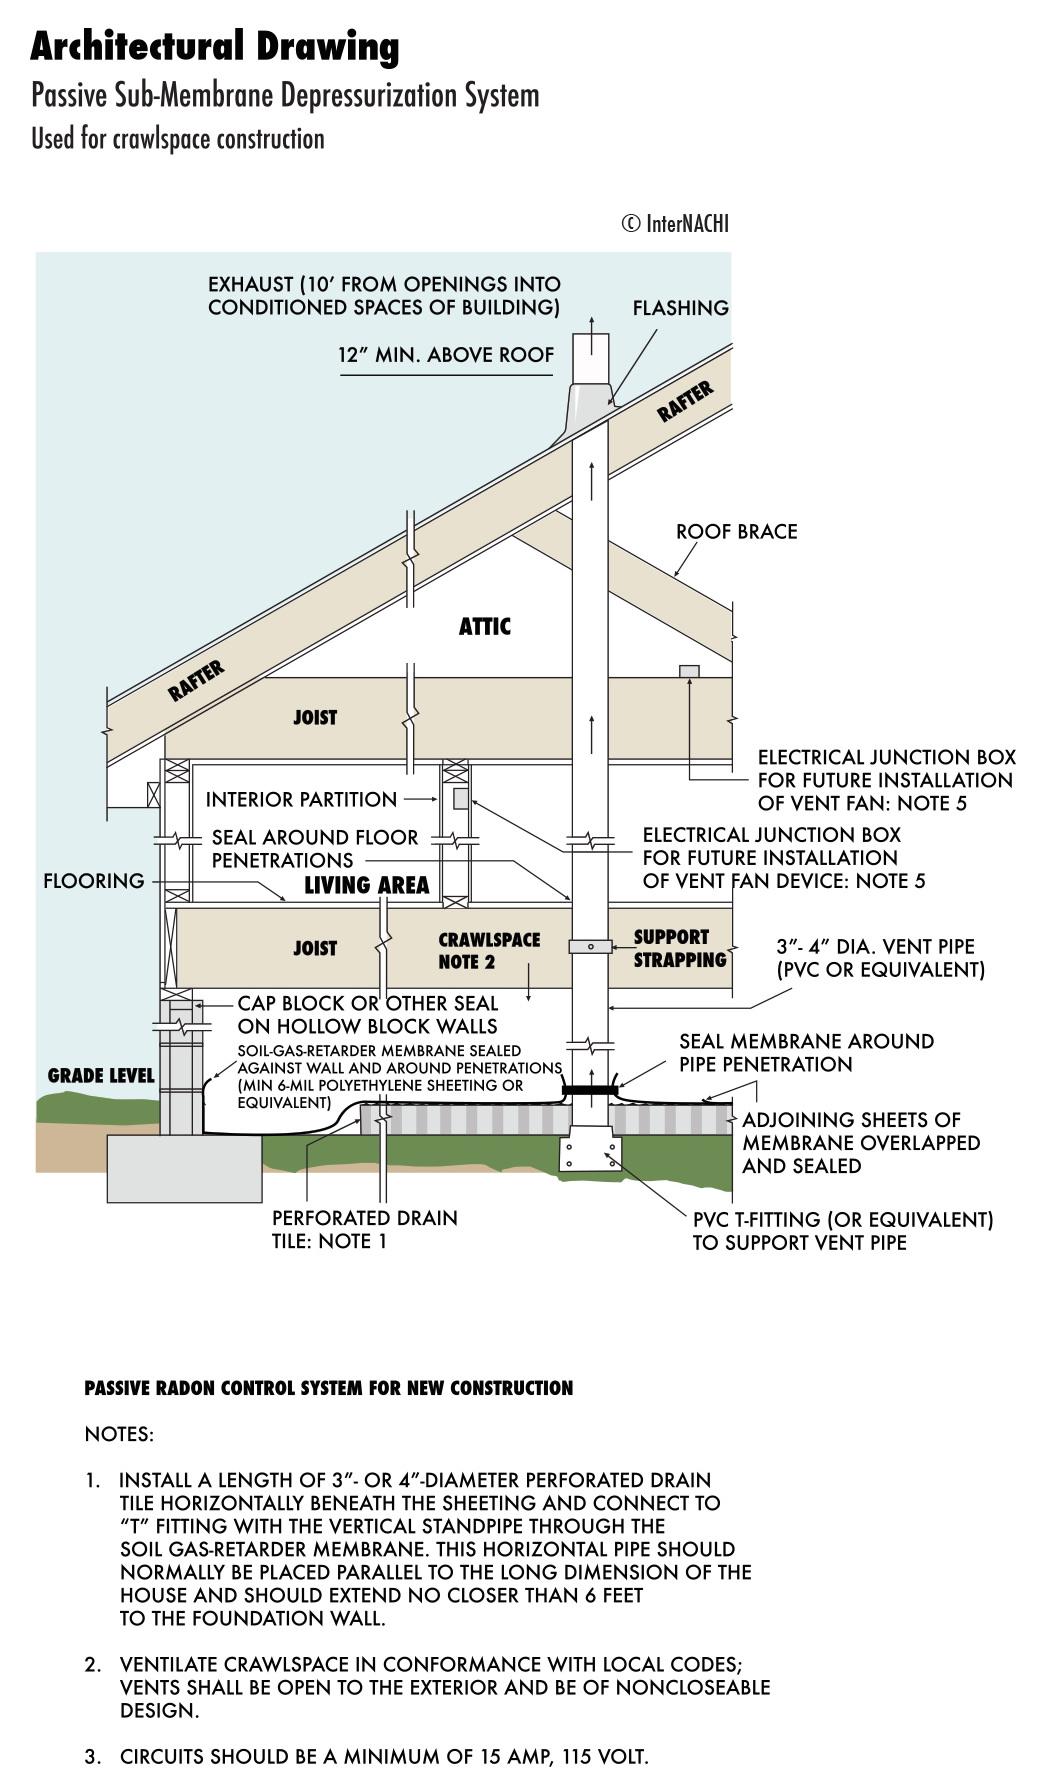 Architectural Drawing of Crawlspace Depressurization Radon System